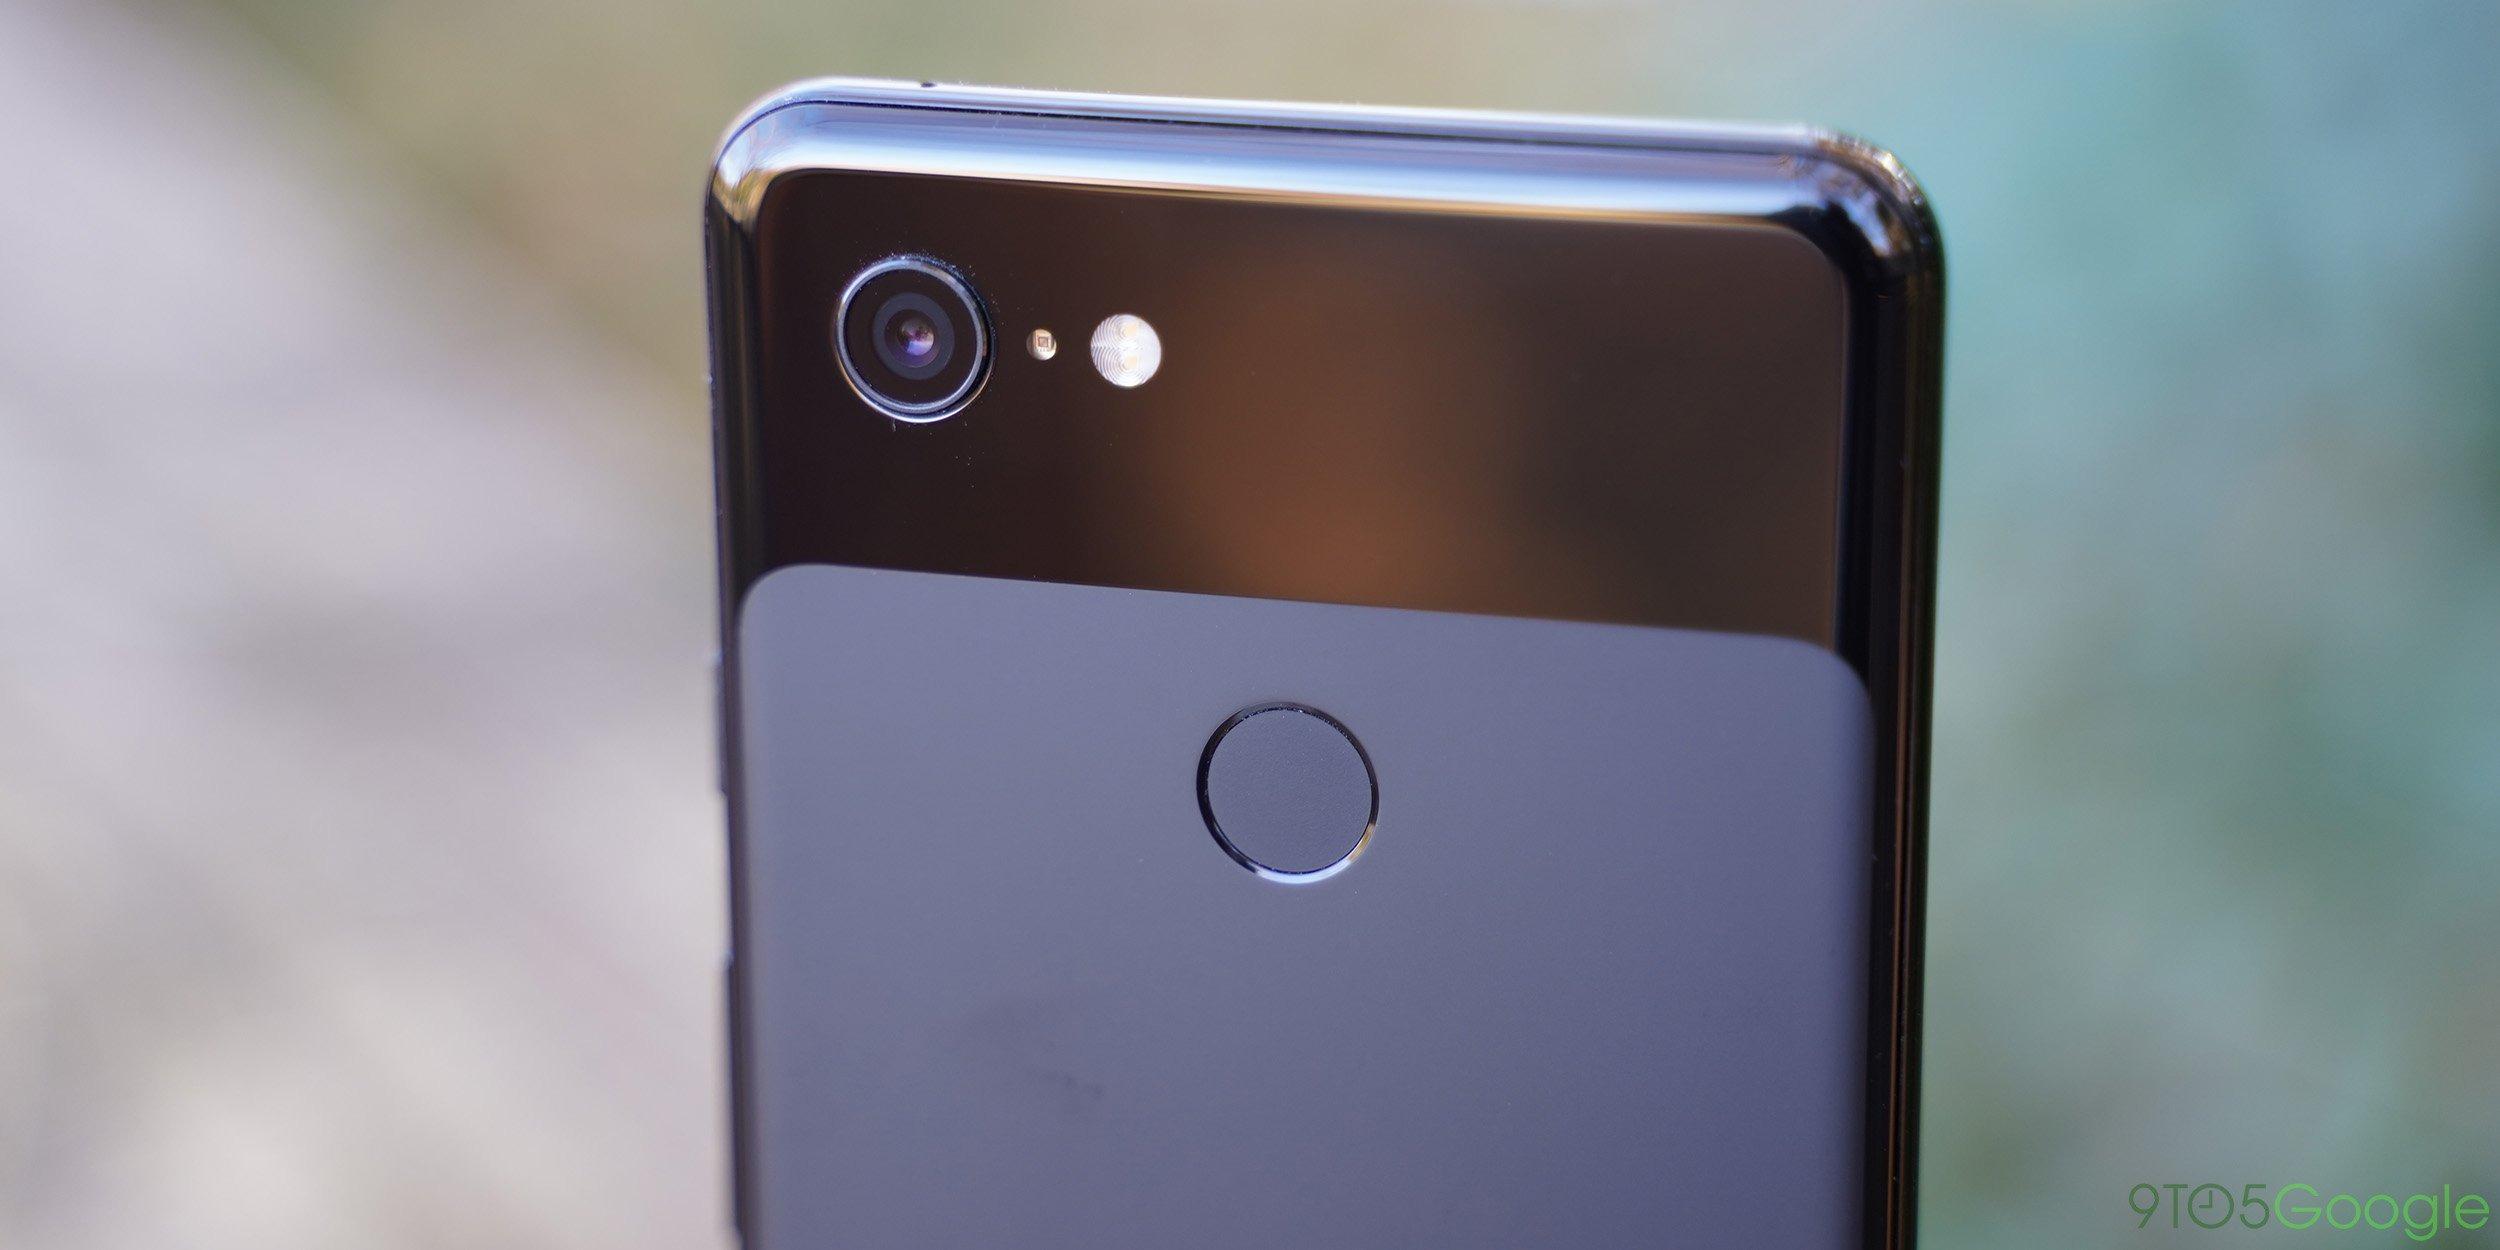 Techmeme: Google Pixel is no longer exclusive to Verizon